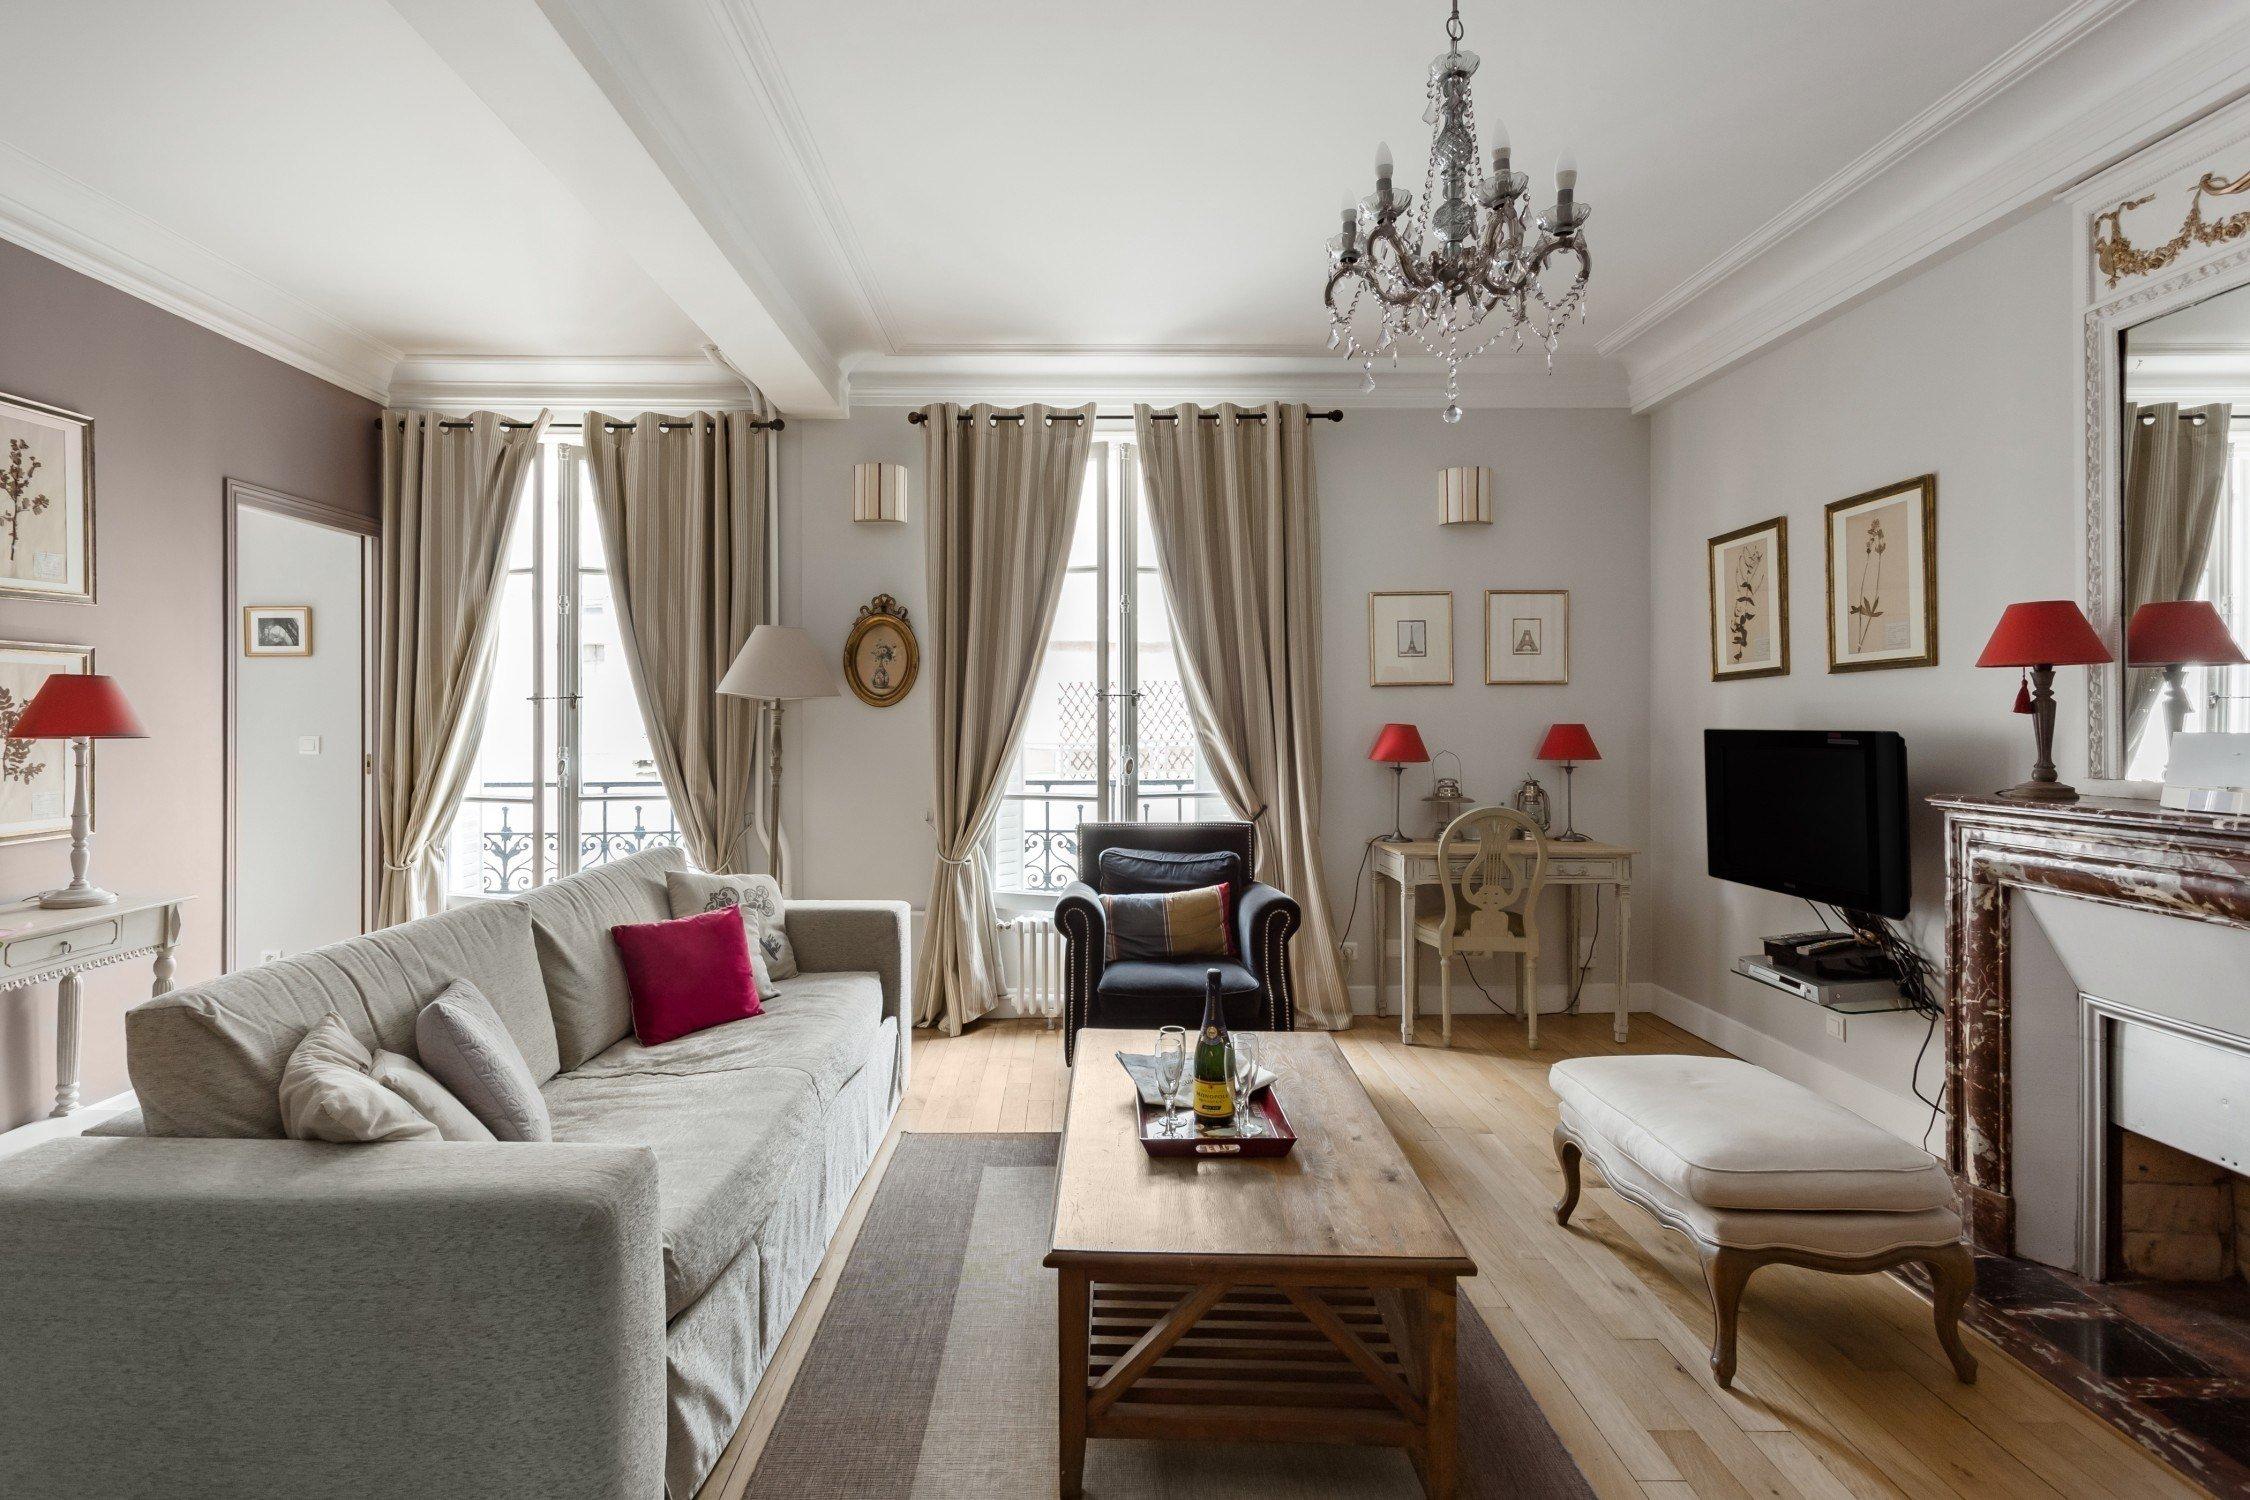 paris accommodation prices